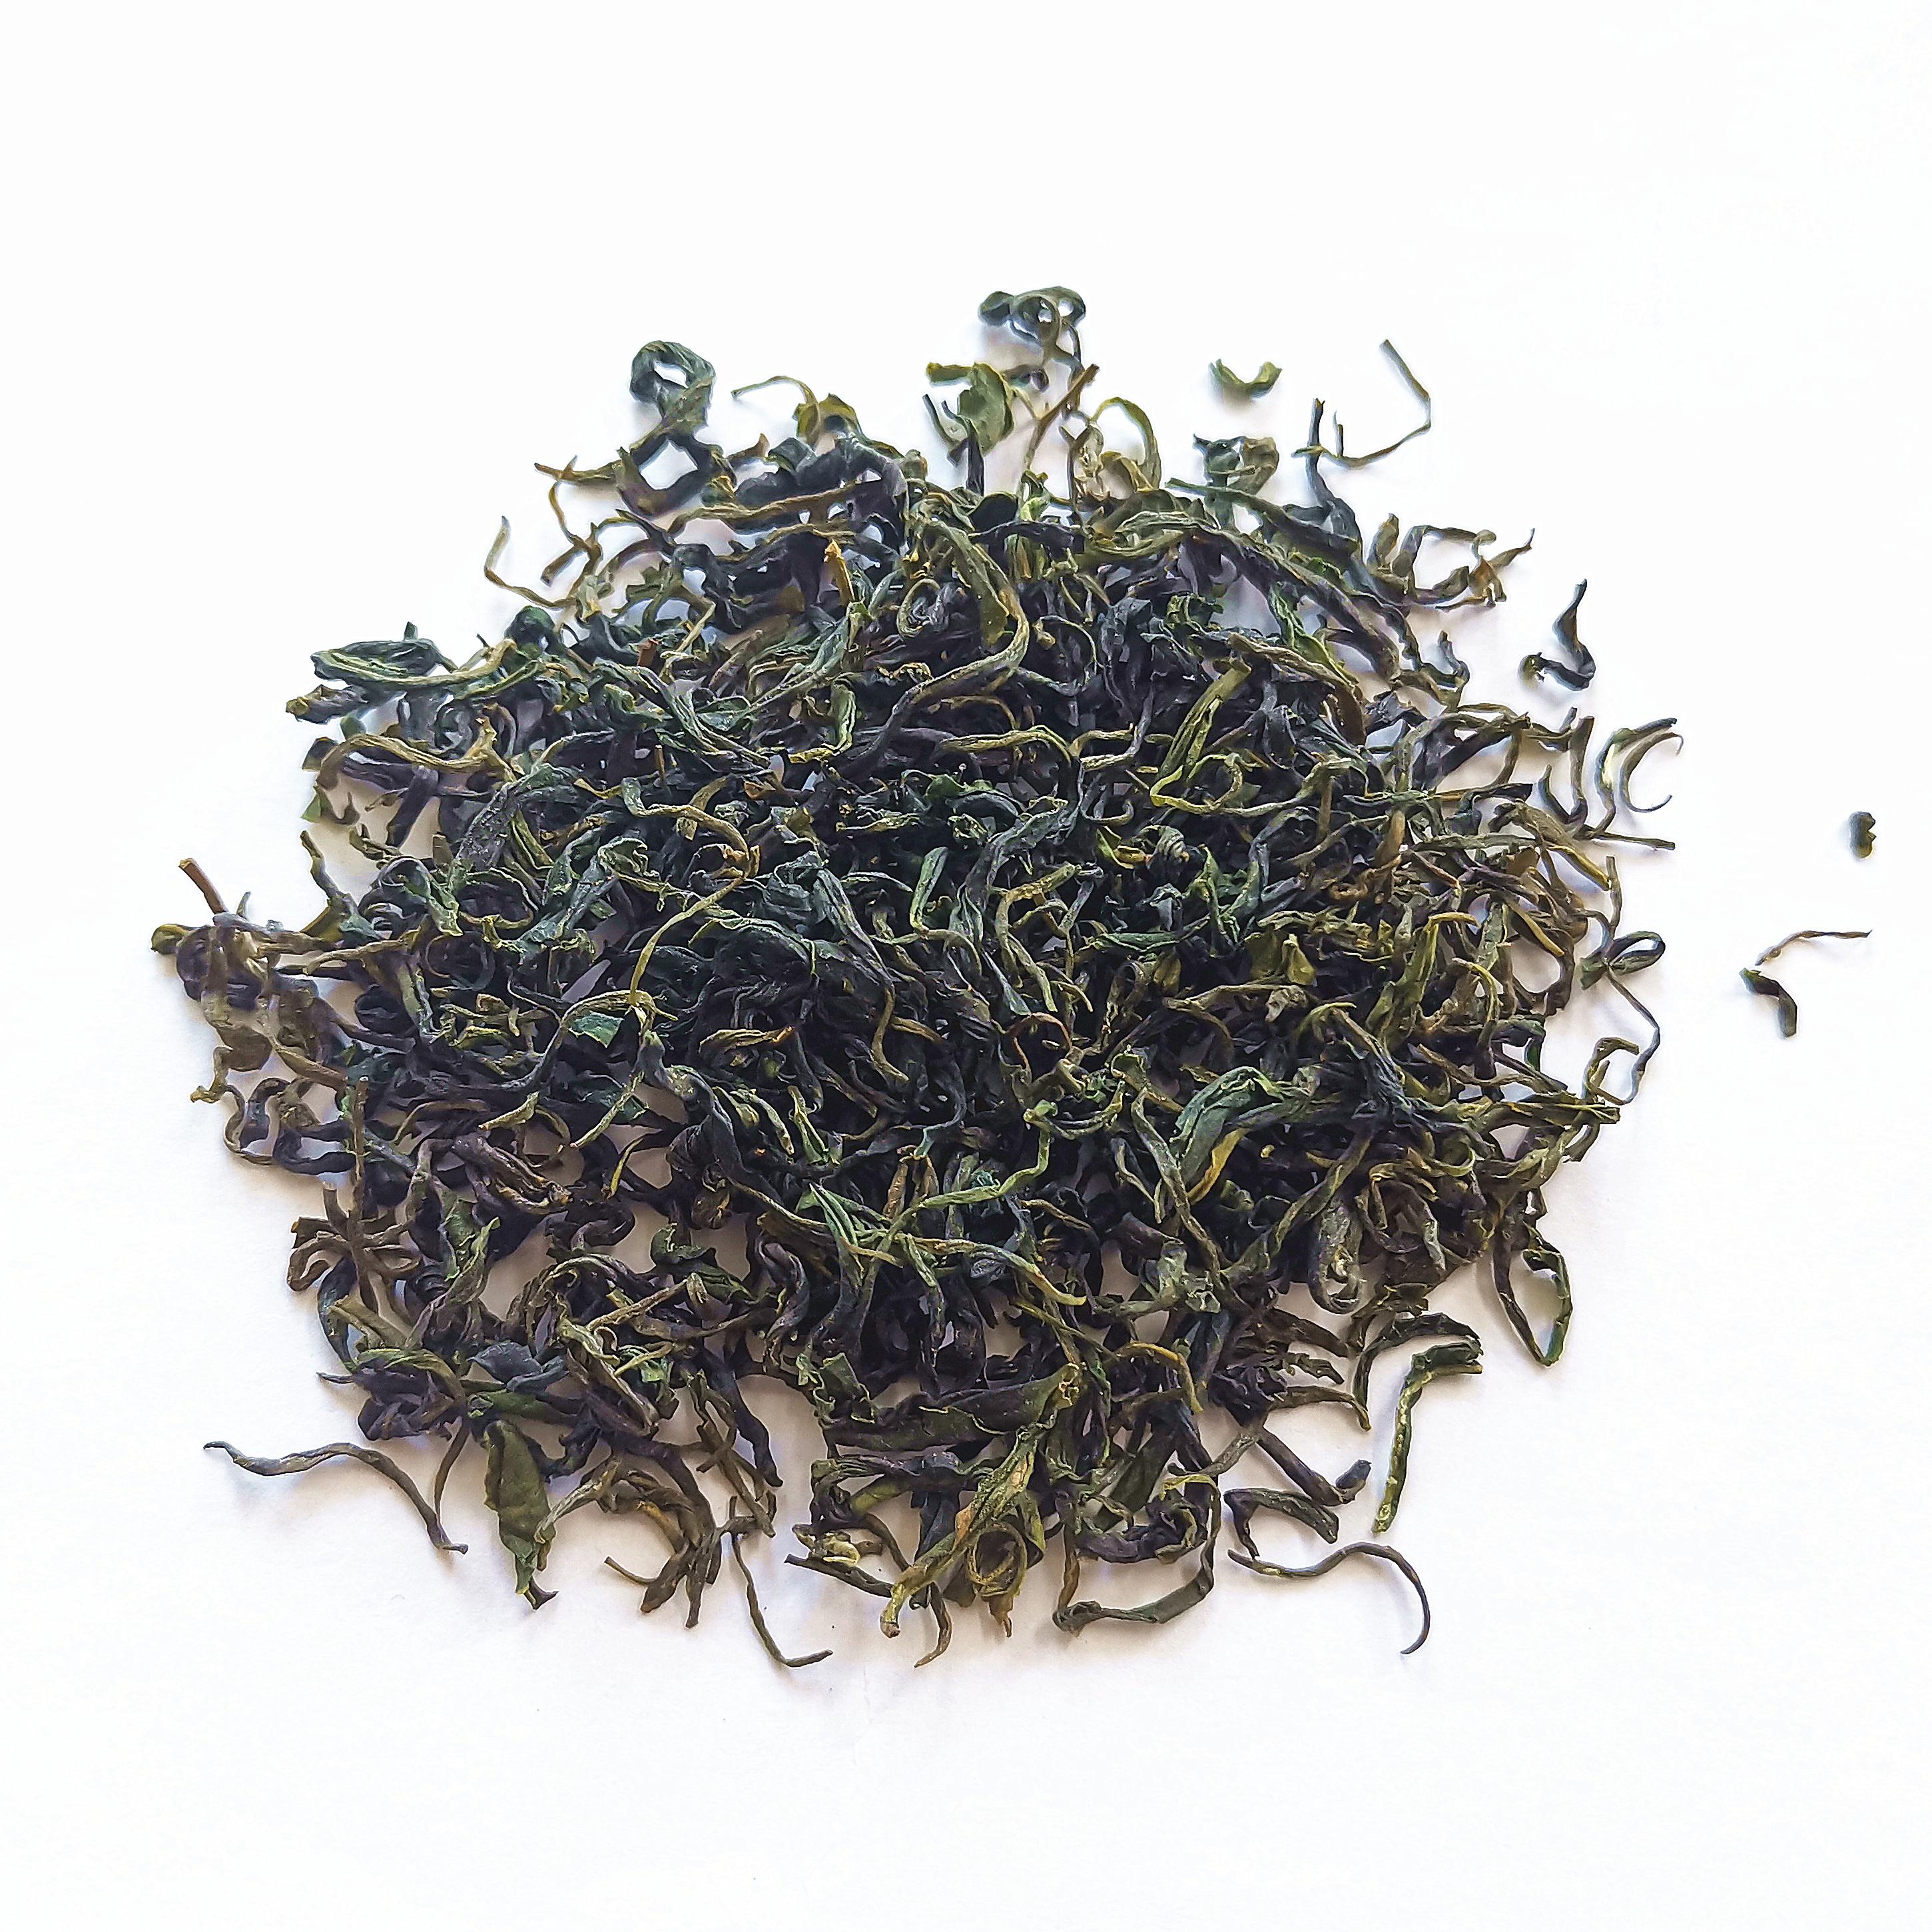 Tea company wholesale tea extract tablets tea green - 4uTea | 4uTea.com